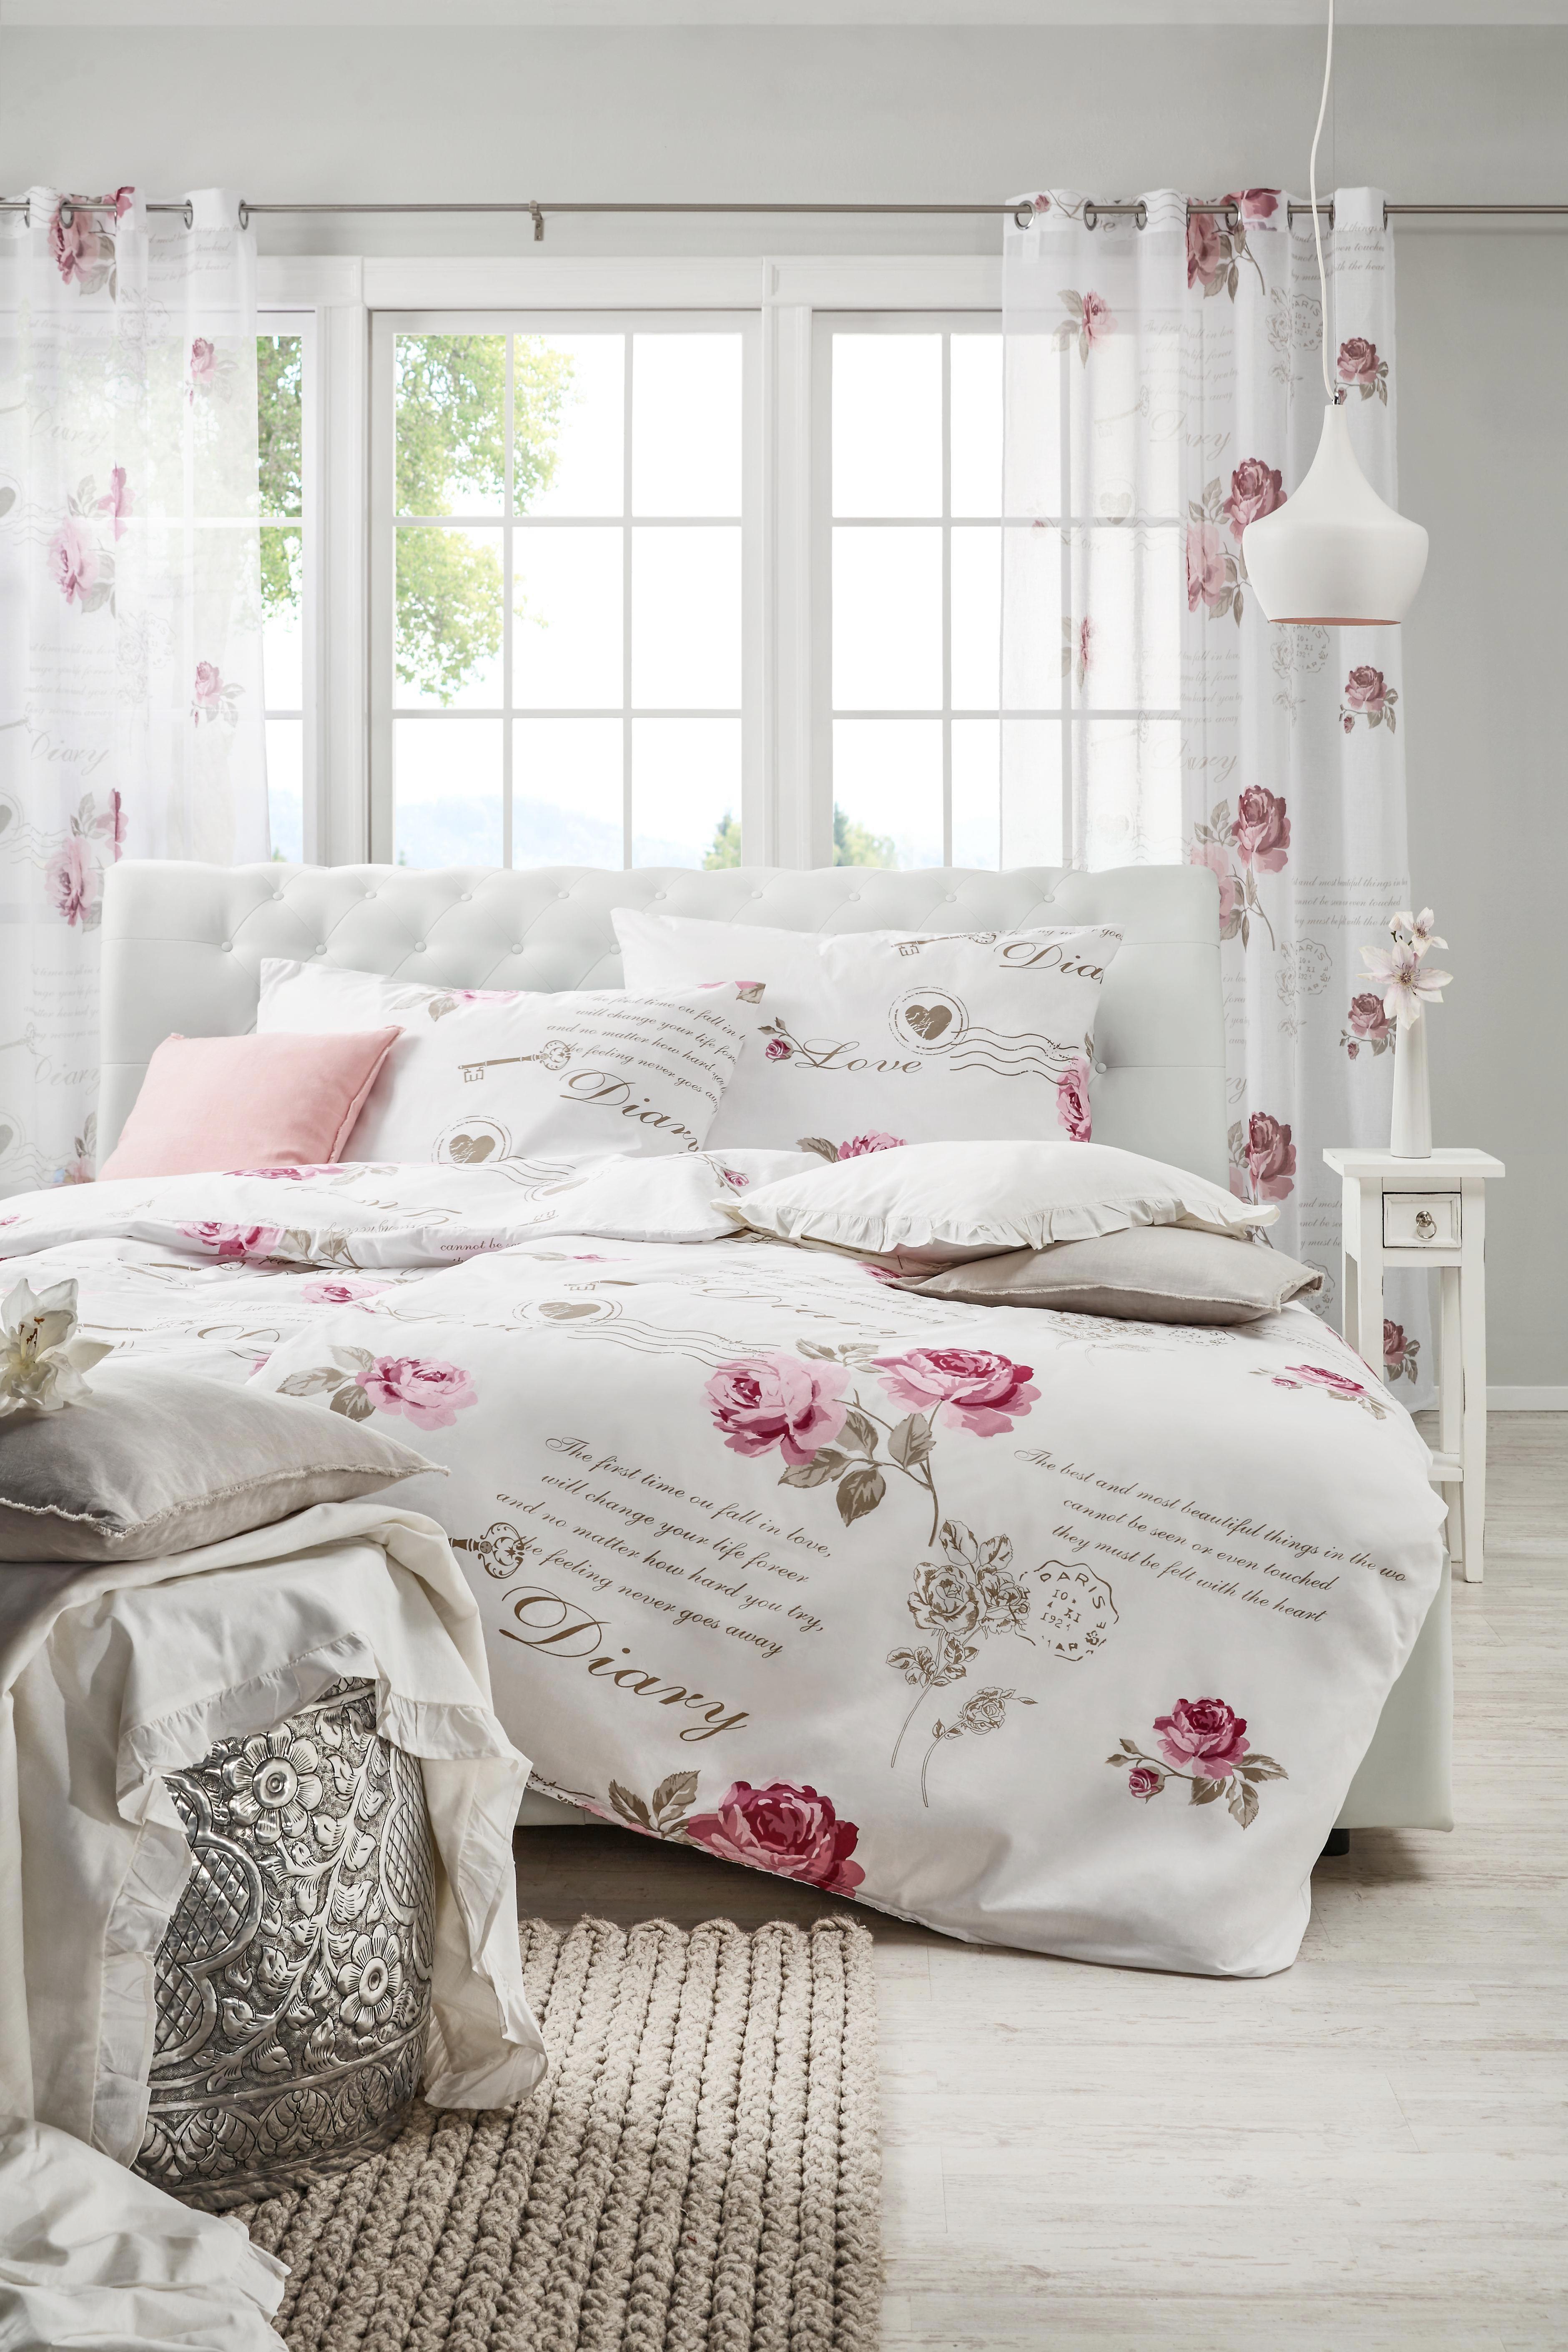 Ösenschal Dairy Rose ca. 140x245cm - Weiß, ROMANTIK / LANDHAUS, Textil (140/245cm) - MÖMAX modern living